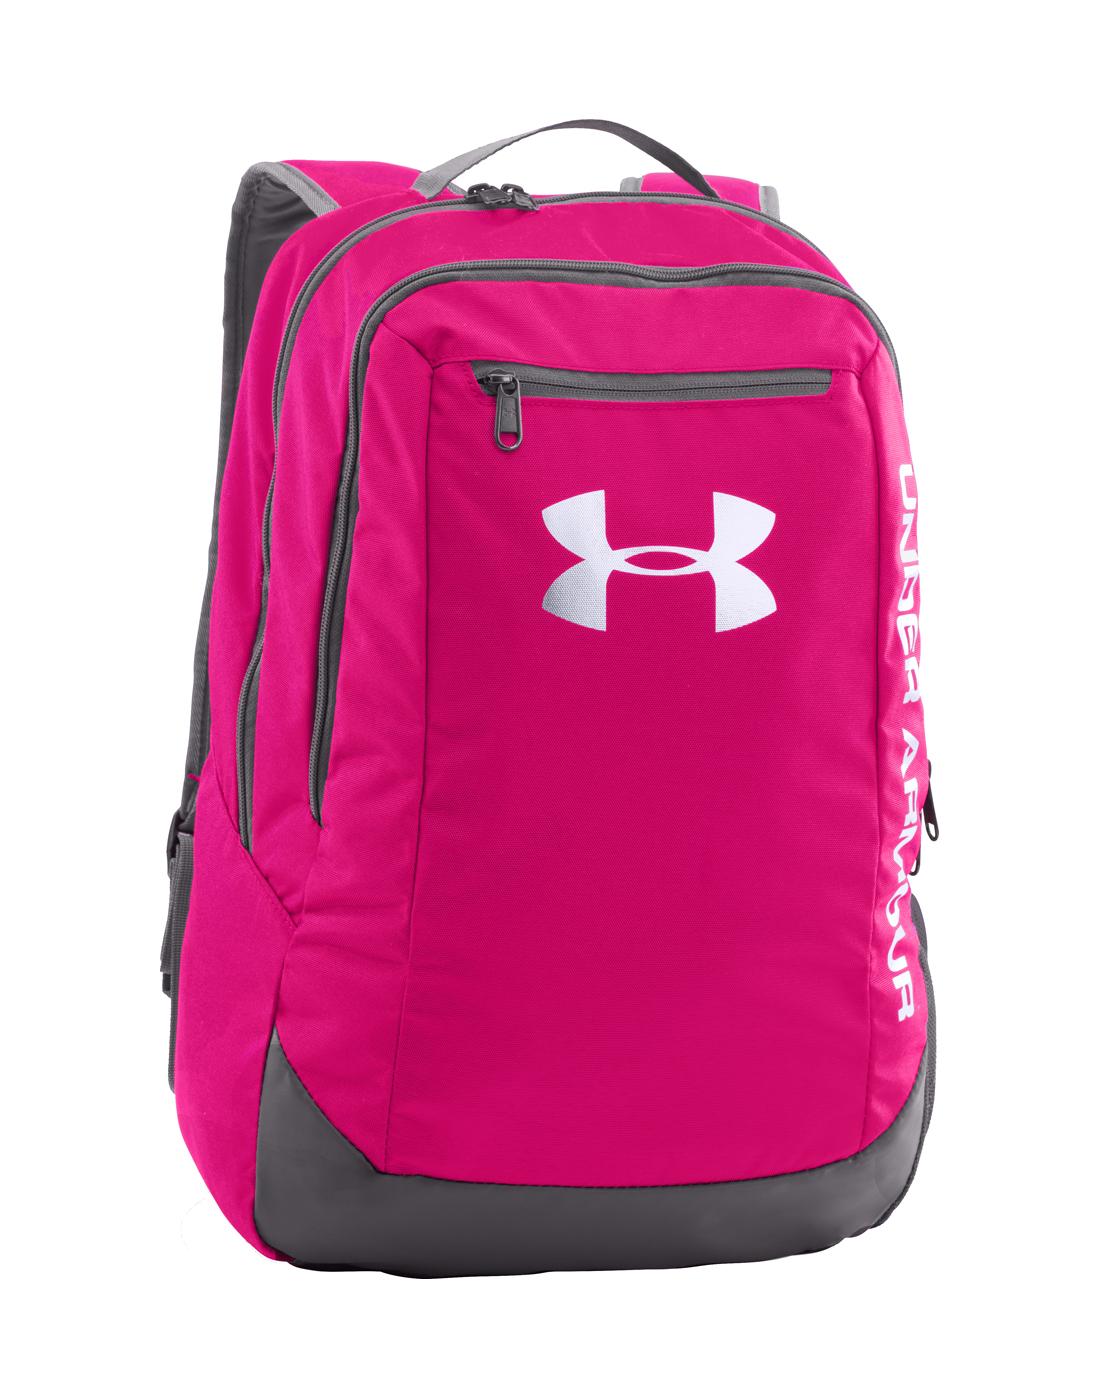 43a1b8a34e Under Armour Hustle Lite backpack